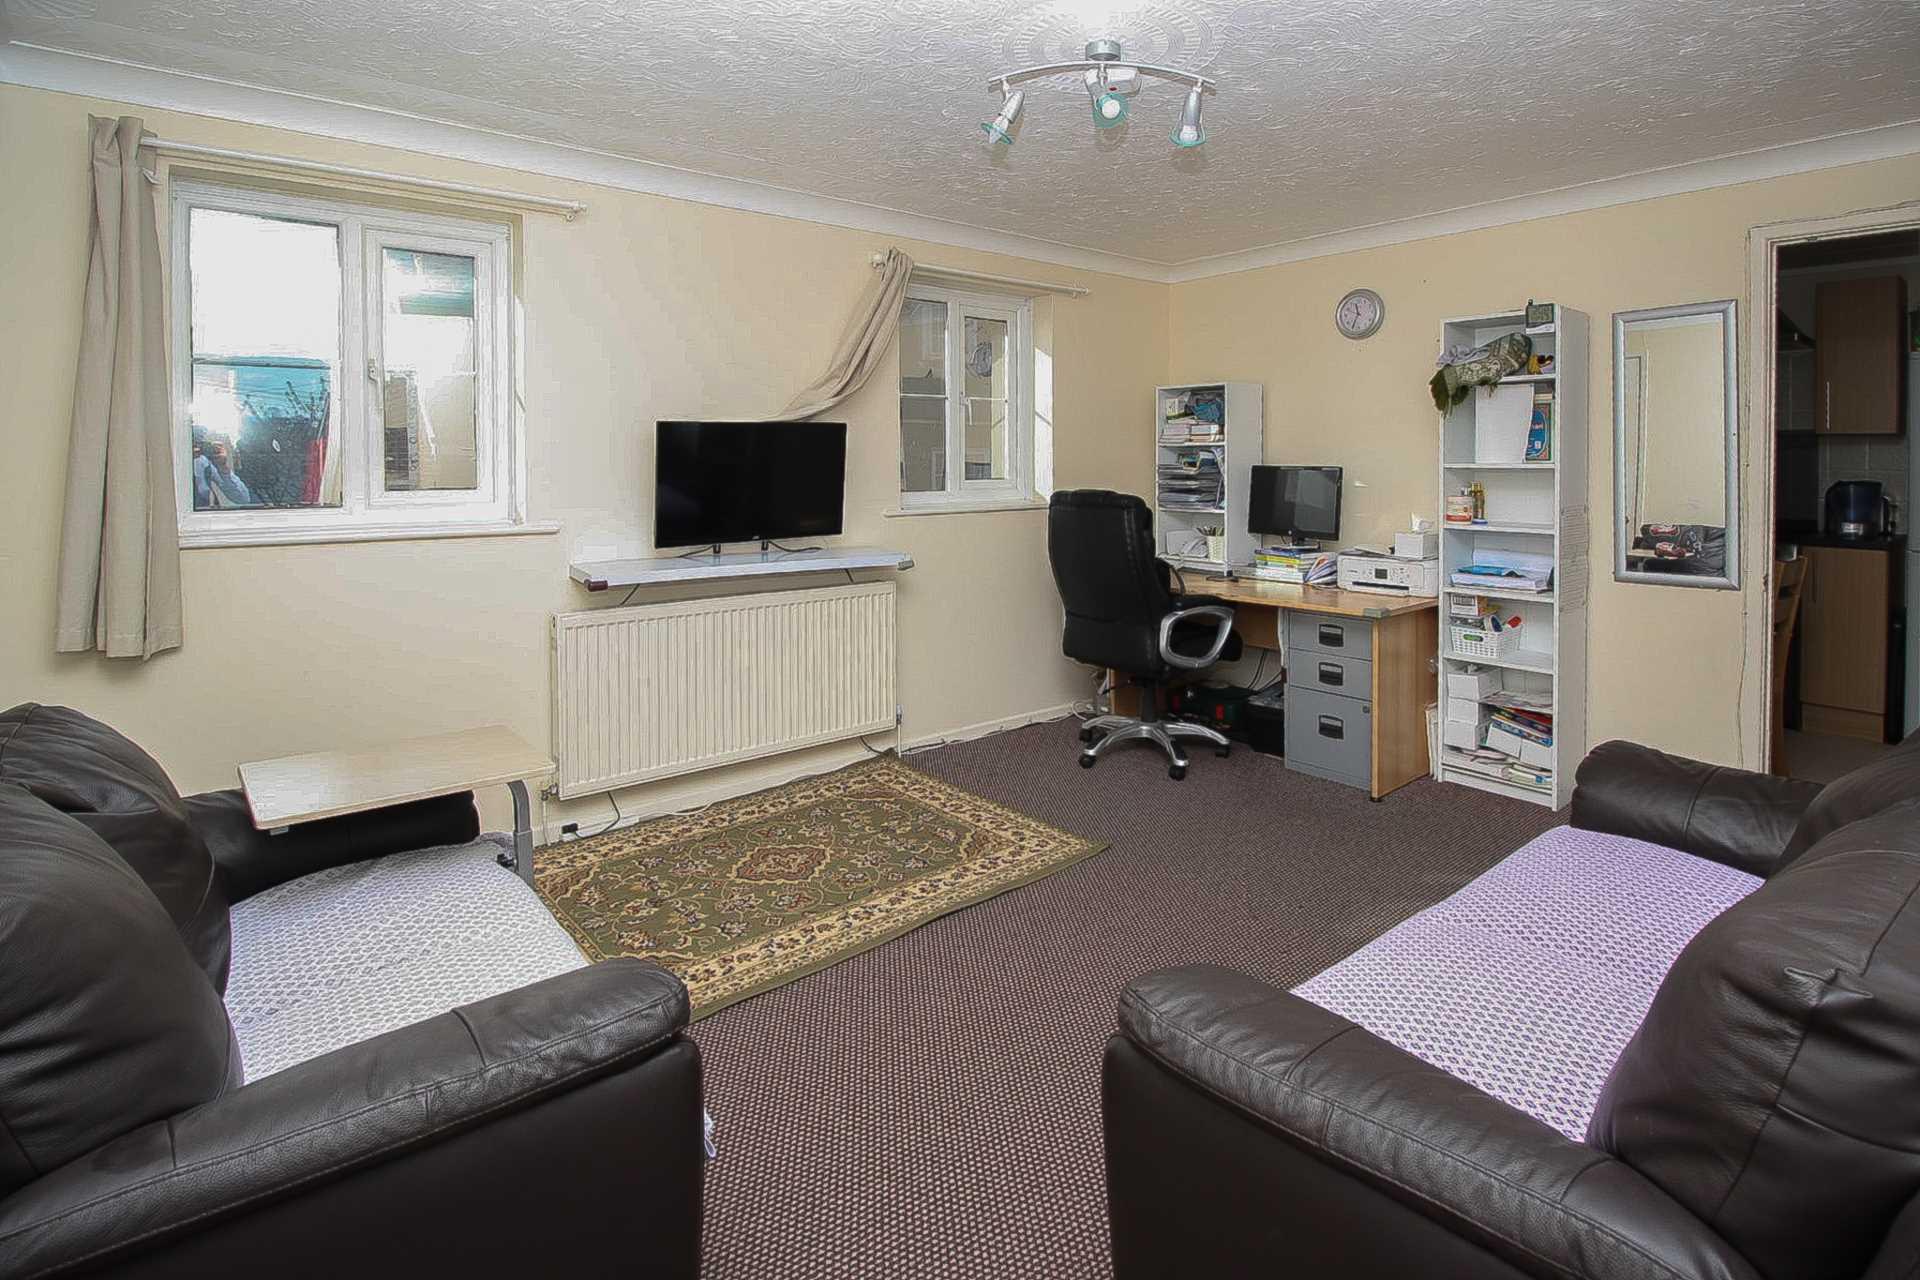 2 bed flat for sale in Dorset Mews, Dorset Street, Blandford Forum  - Property Image 3